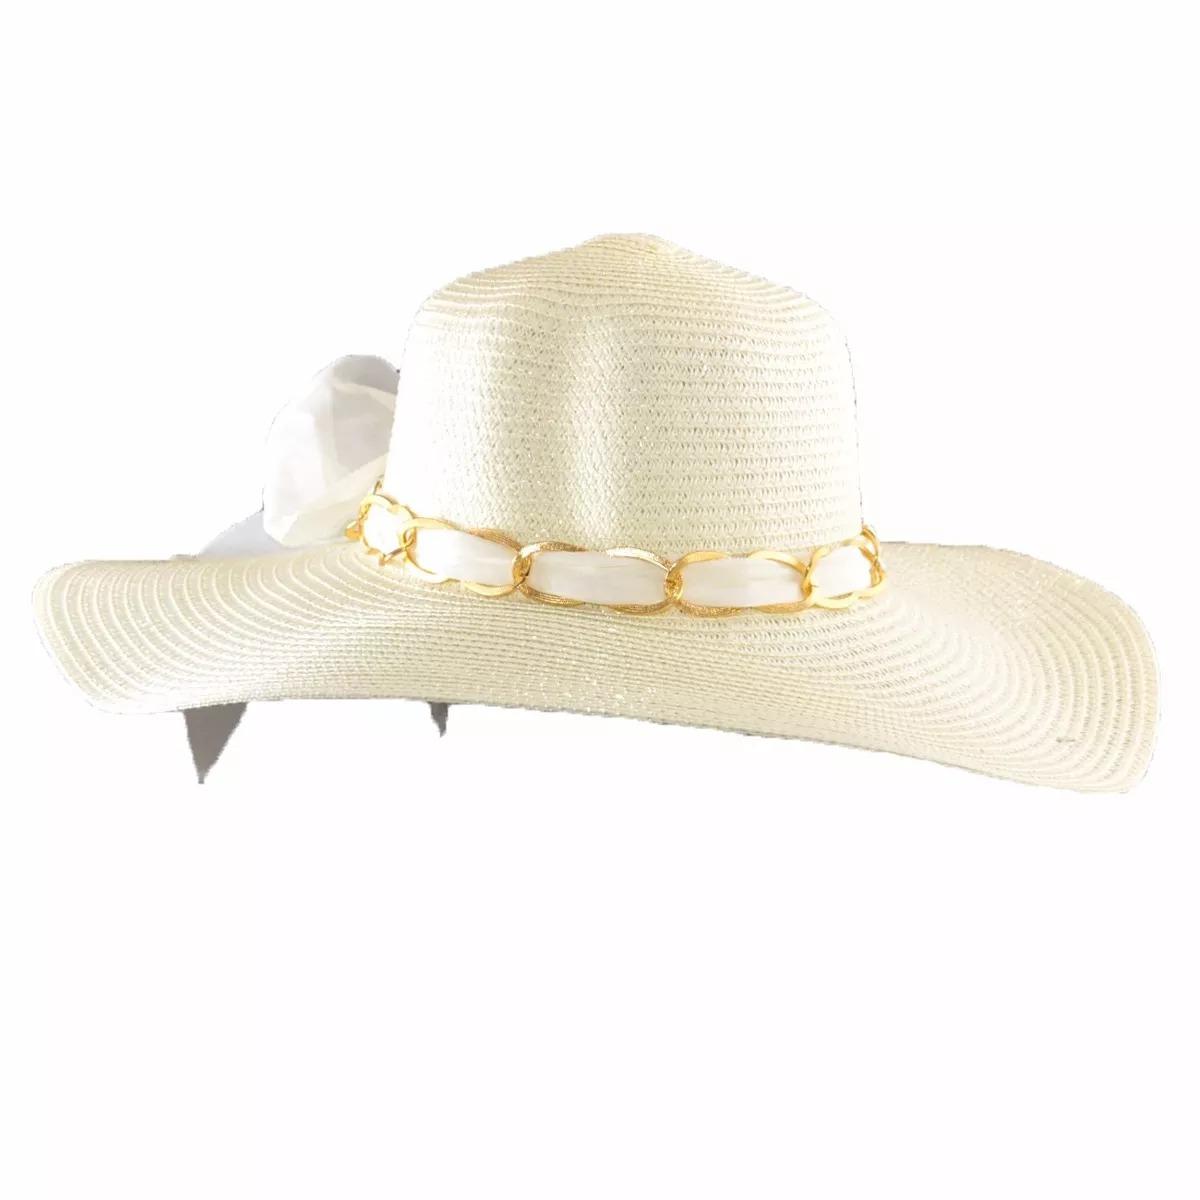 Hermoso Sombrero Capelina Pamela Para Mujer Ala Larga -   299.00 en ... 02704818c5f